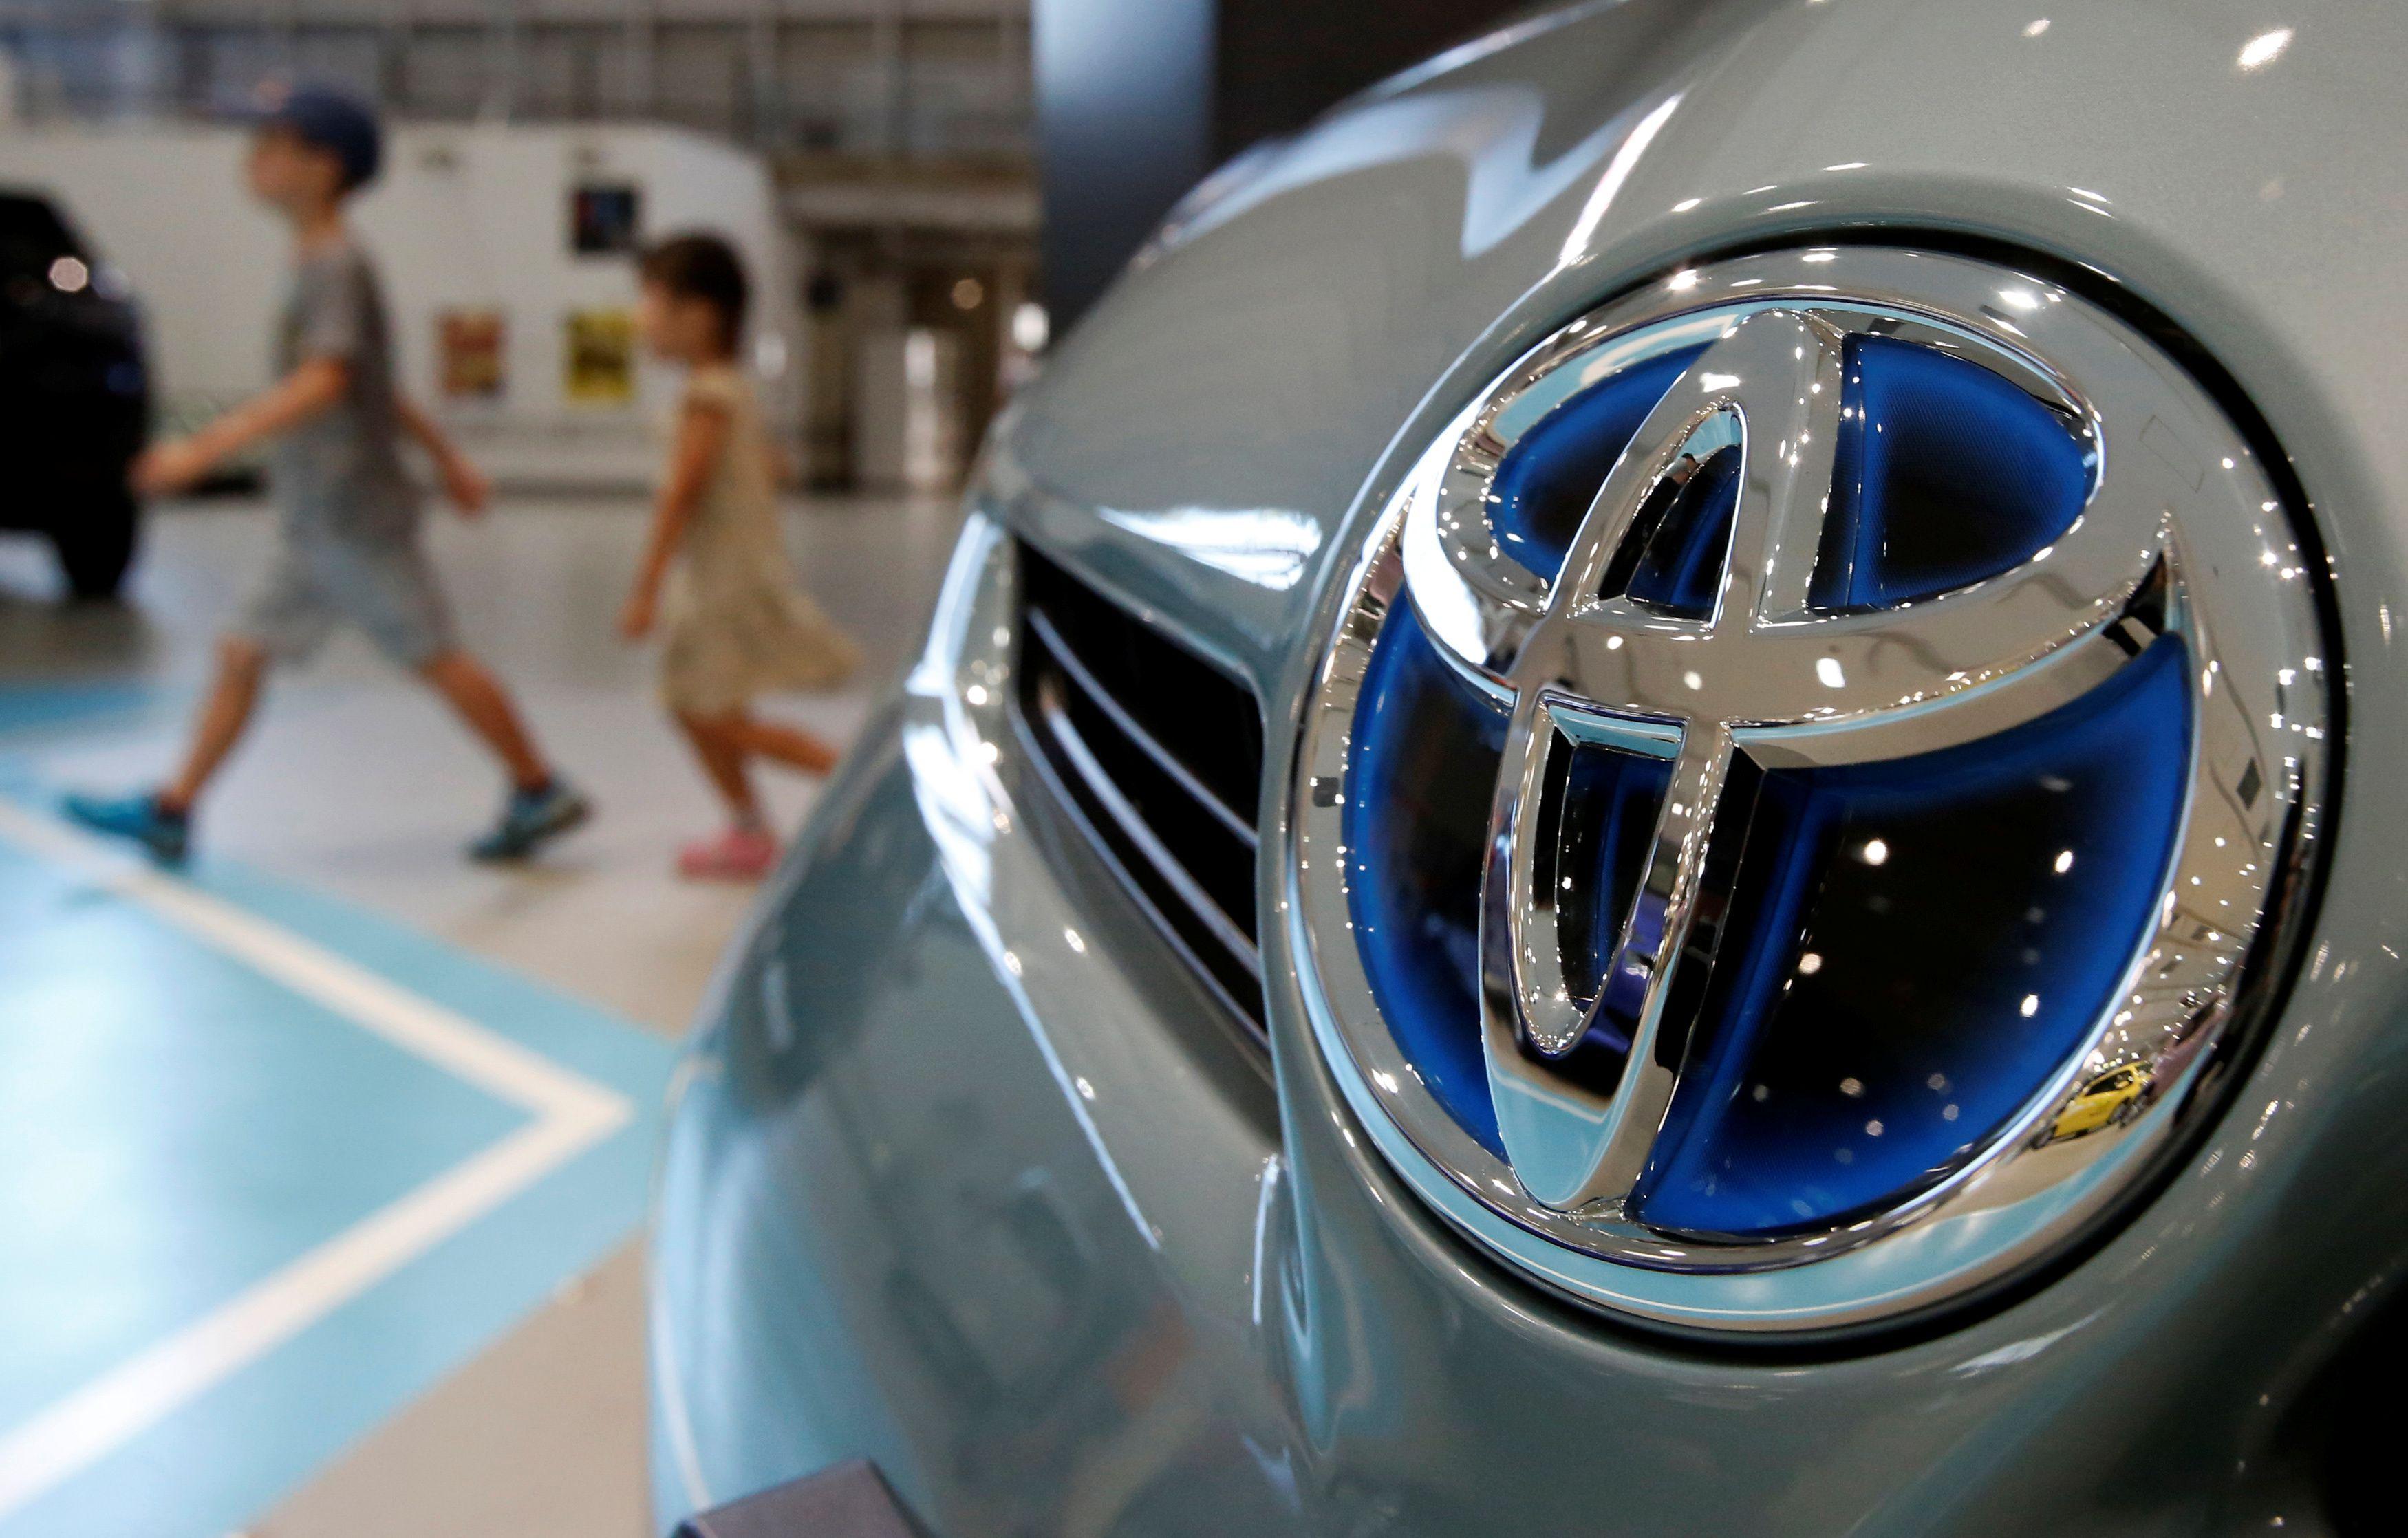 General Motors Volkswagen To Stop Production Of Hybrid Vehicles